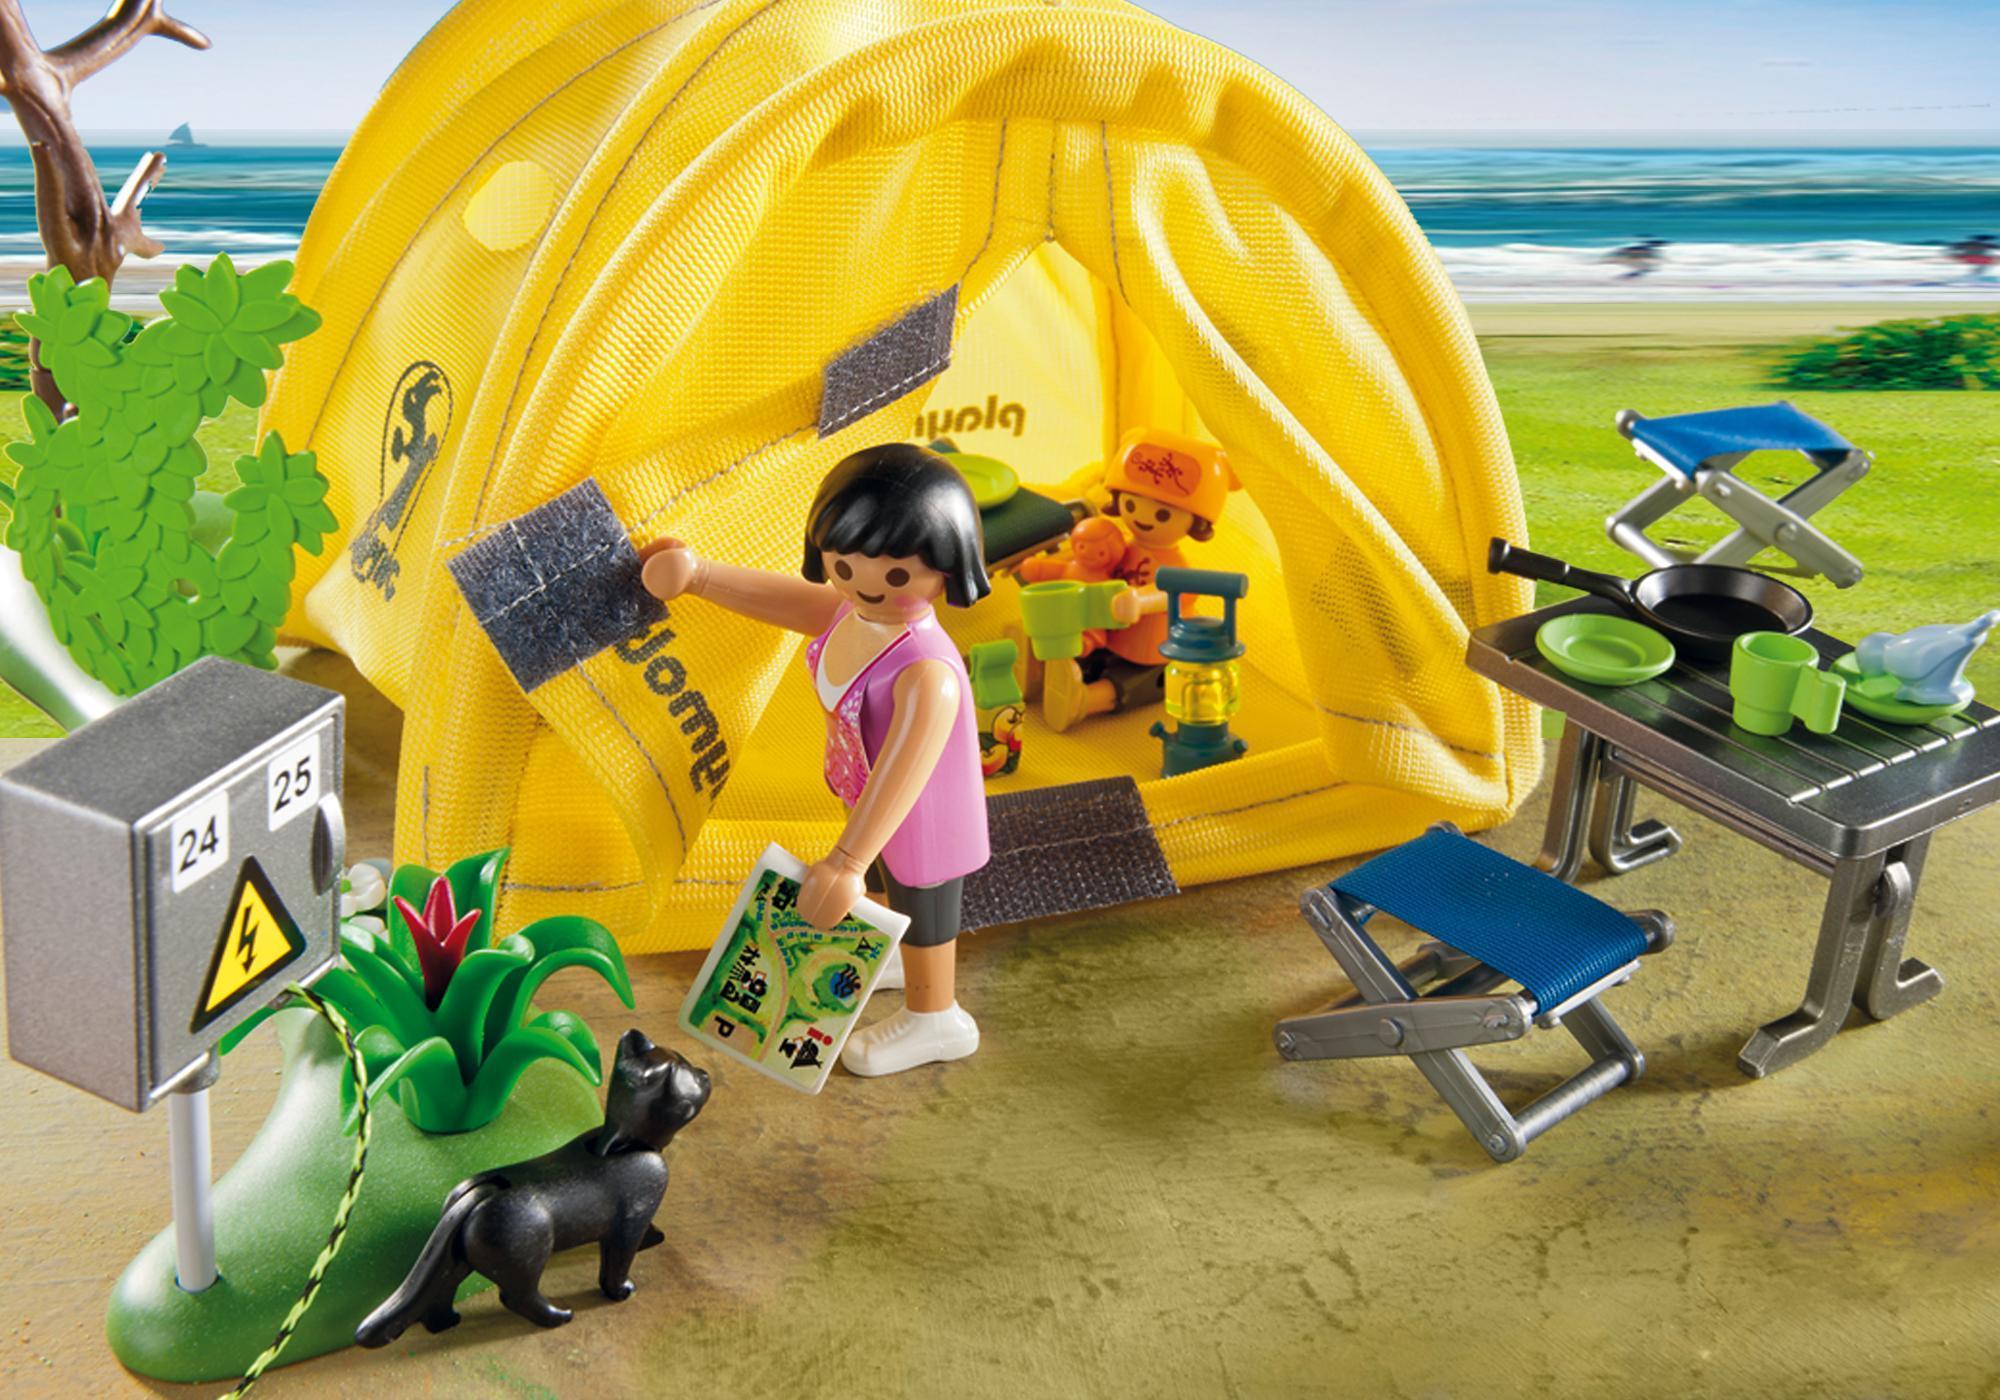 http://media.playmobil.com/i/playmobil/5435_product_extra1/Family Camping Trip